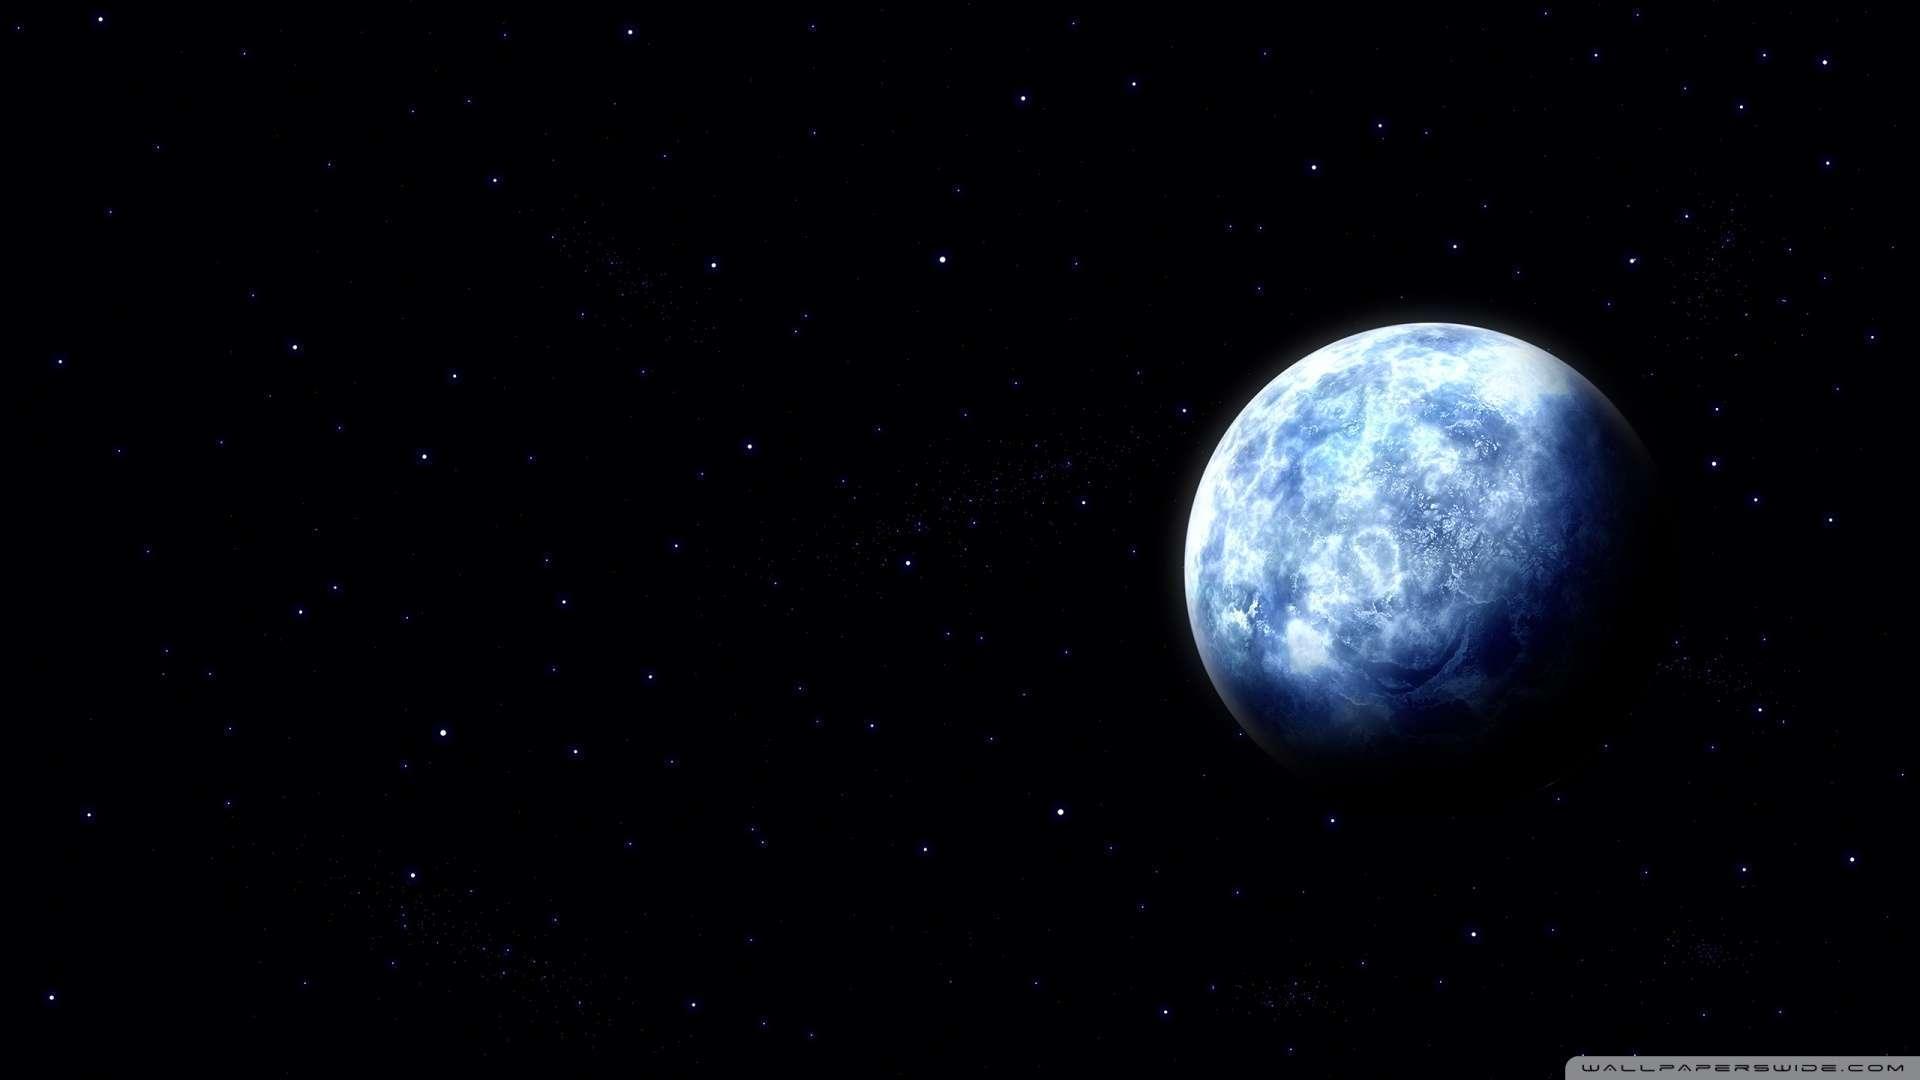 Blue Hd Wallpapers 1080p: 1080 HD Wallpaper Blue